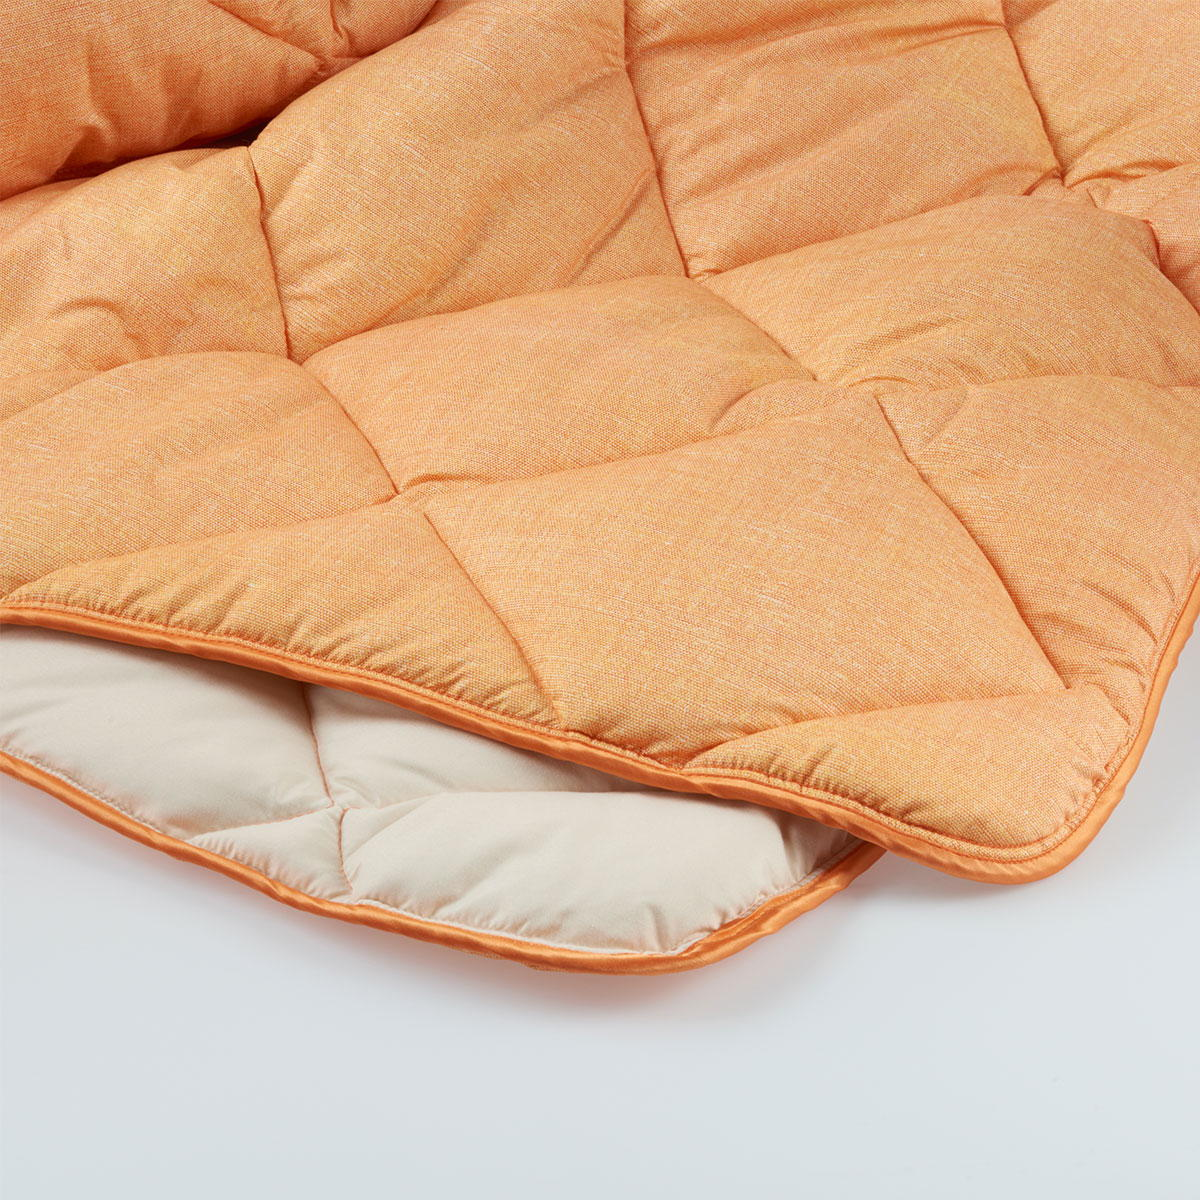 la couette d corative edredecor vintage standard textile. Black Bedroom Furniture Sets. Home Design Ideas